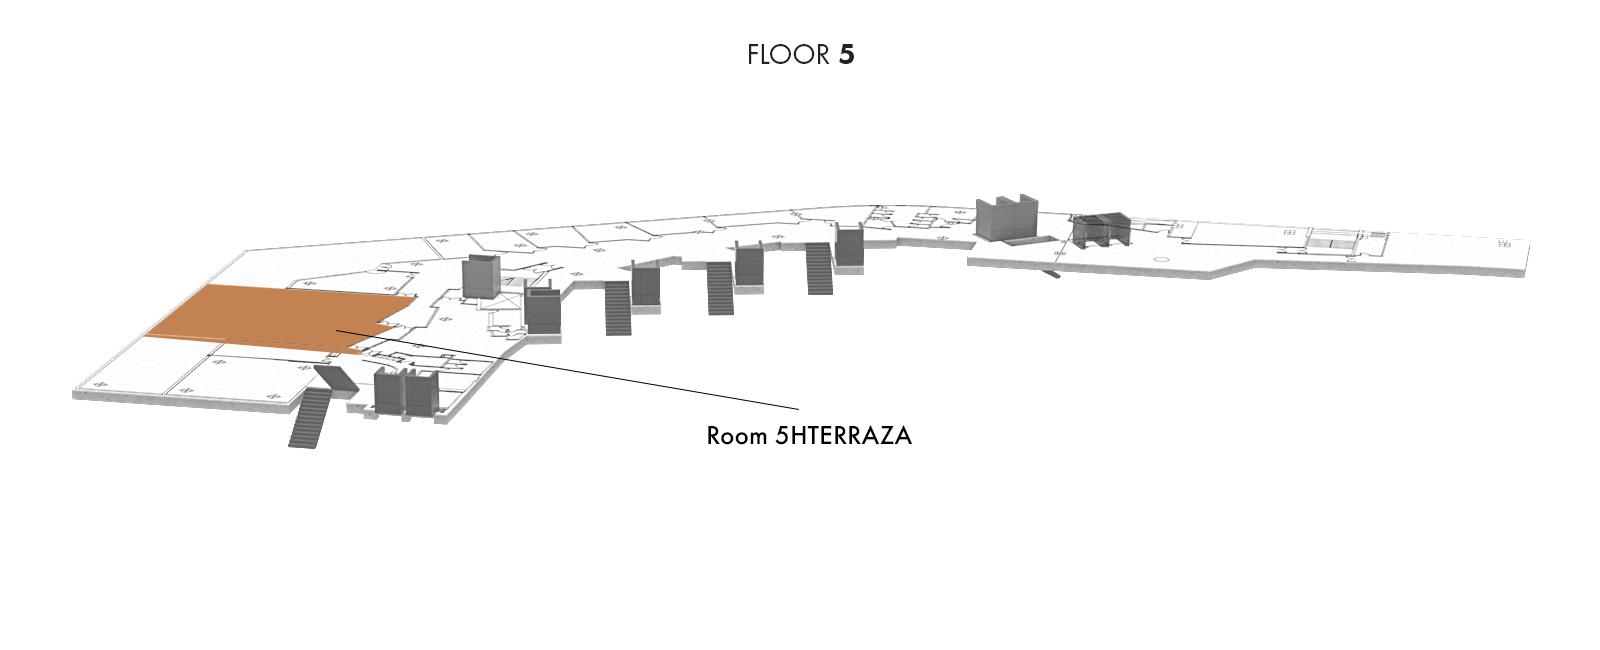 Room 5HTERRAZA, Floor 5 | Palacio Euskalduna Jauregia